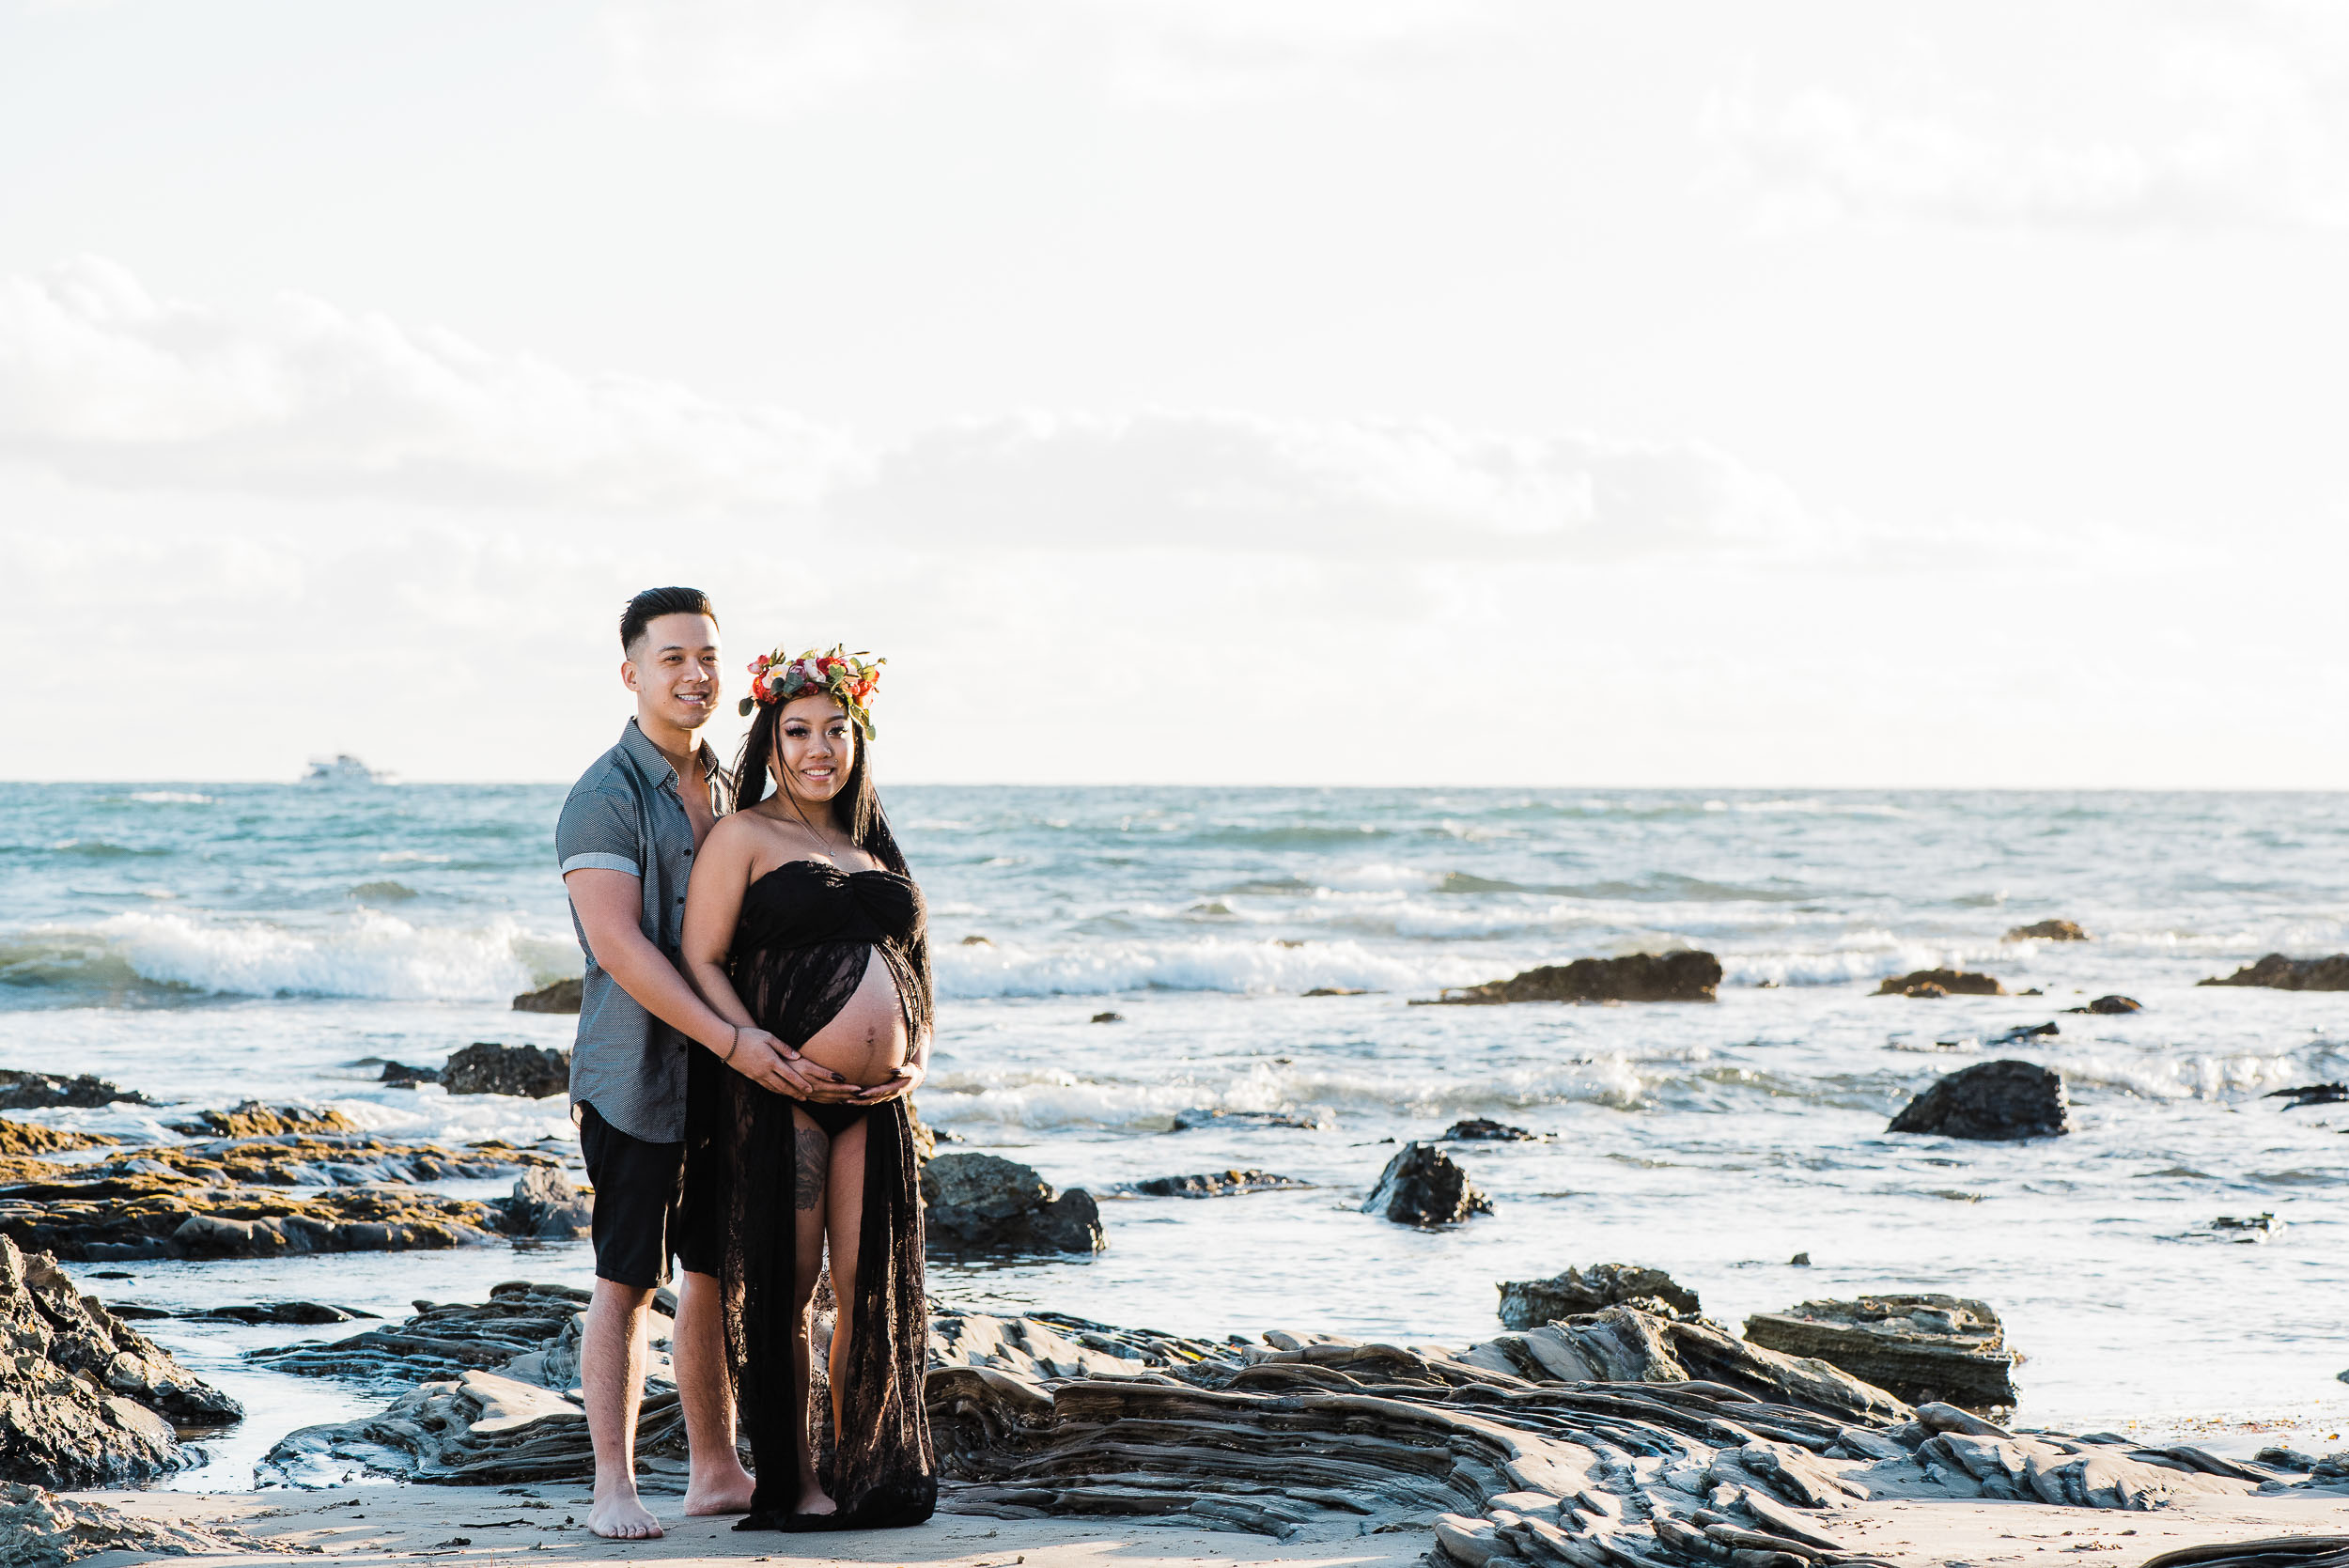 Miraflor-Photo-Peter-Crystal-Maternity-Photoshoot-Newport-Beach-20180317-028.jpg